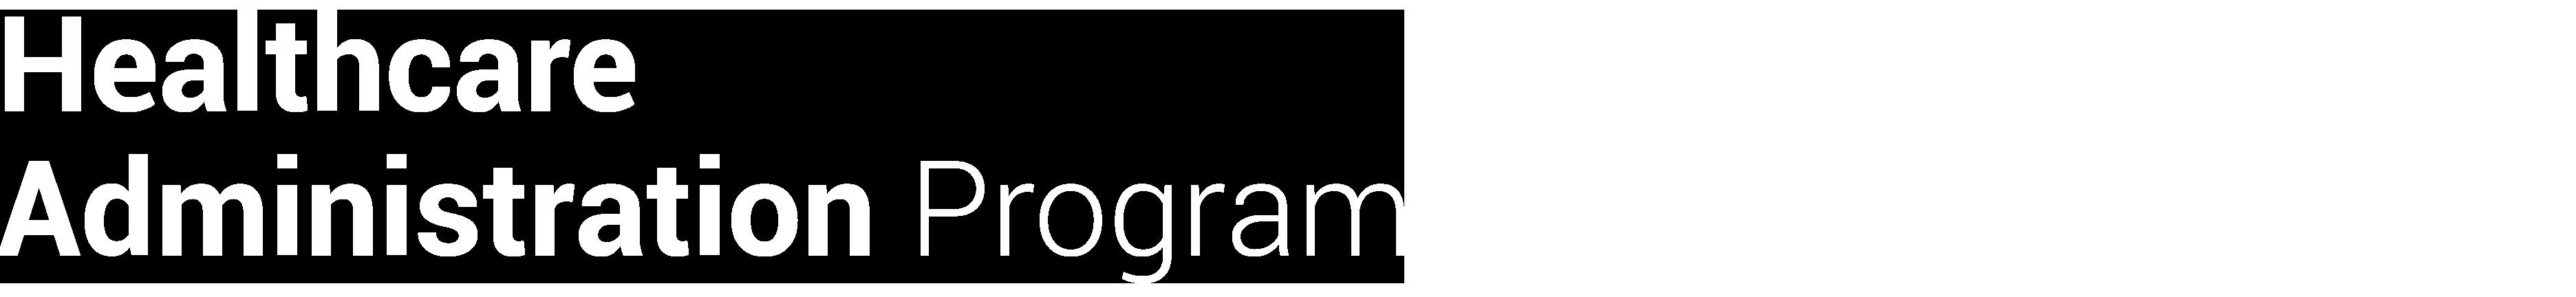 Healthcare Administration Program - Bachelors